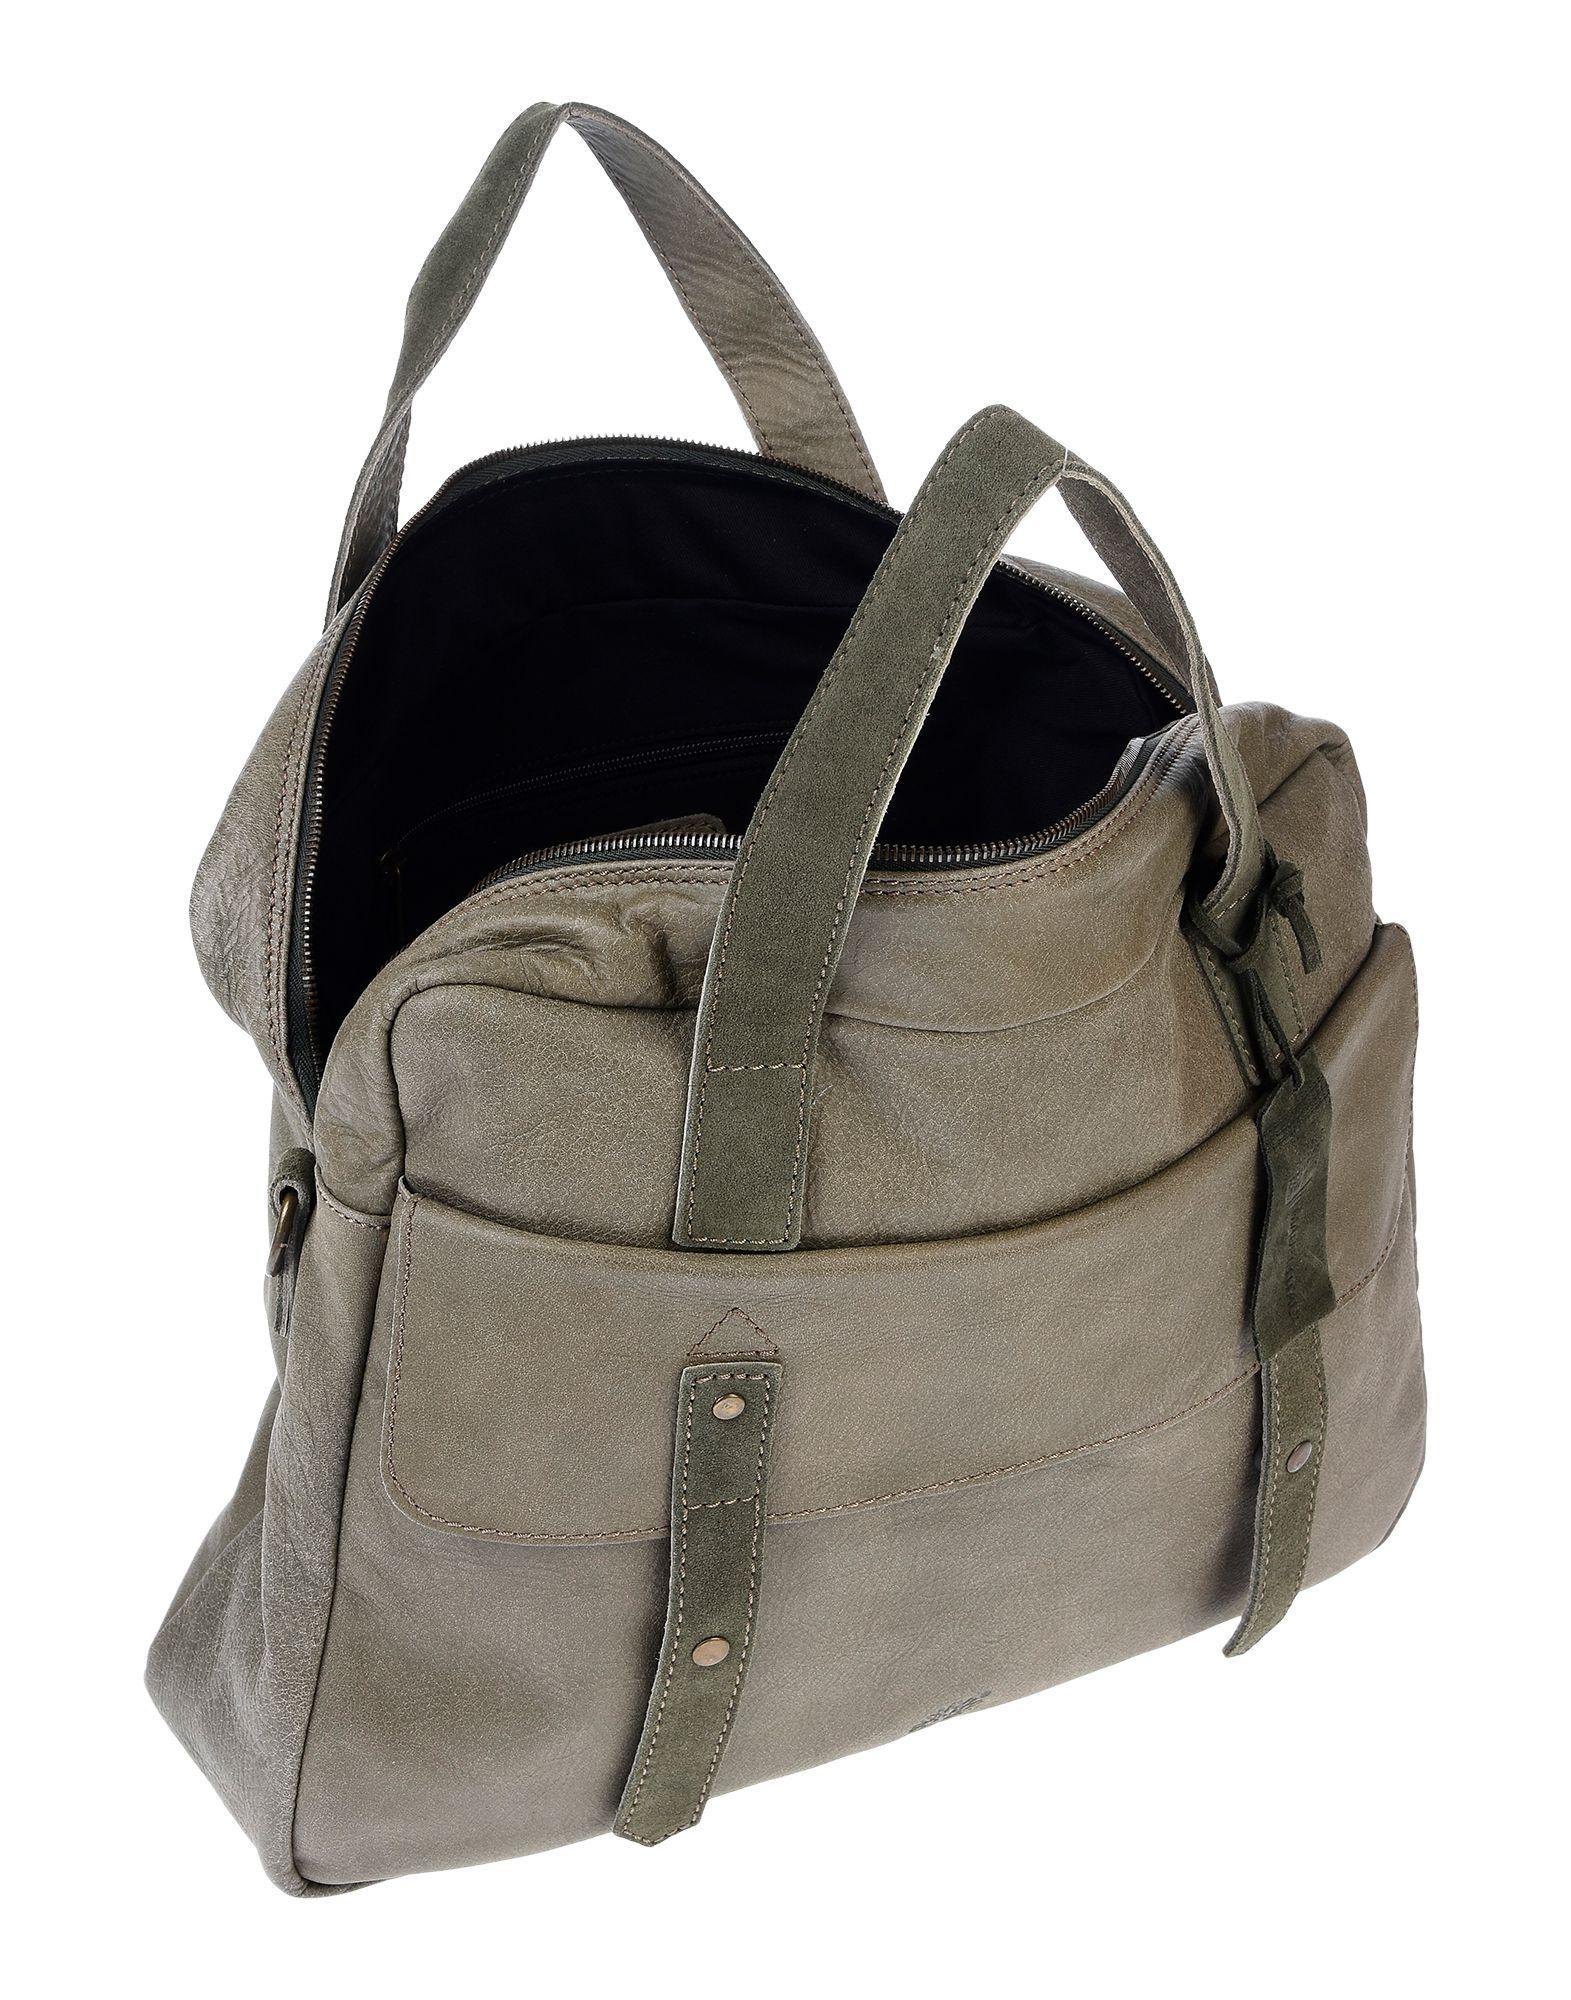 22ea62cd58 Lyst - Timberland Handbag for Men